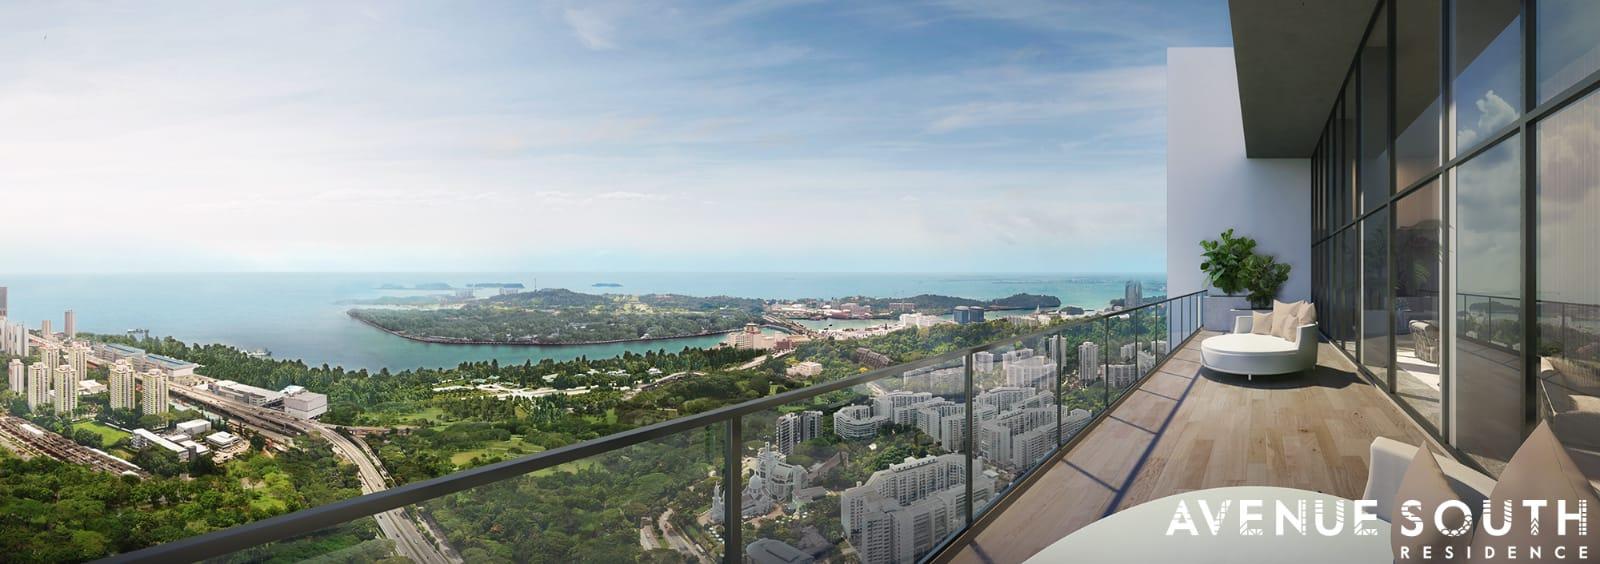 avenue south residences sea view